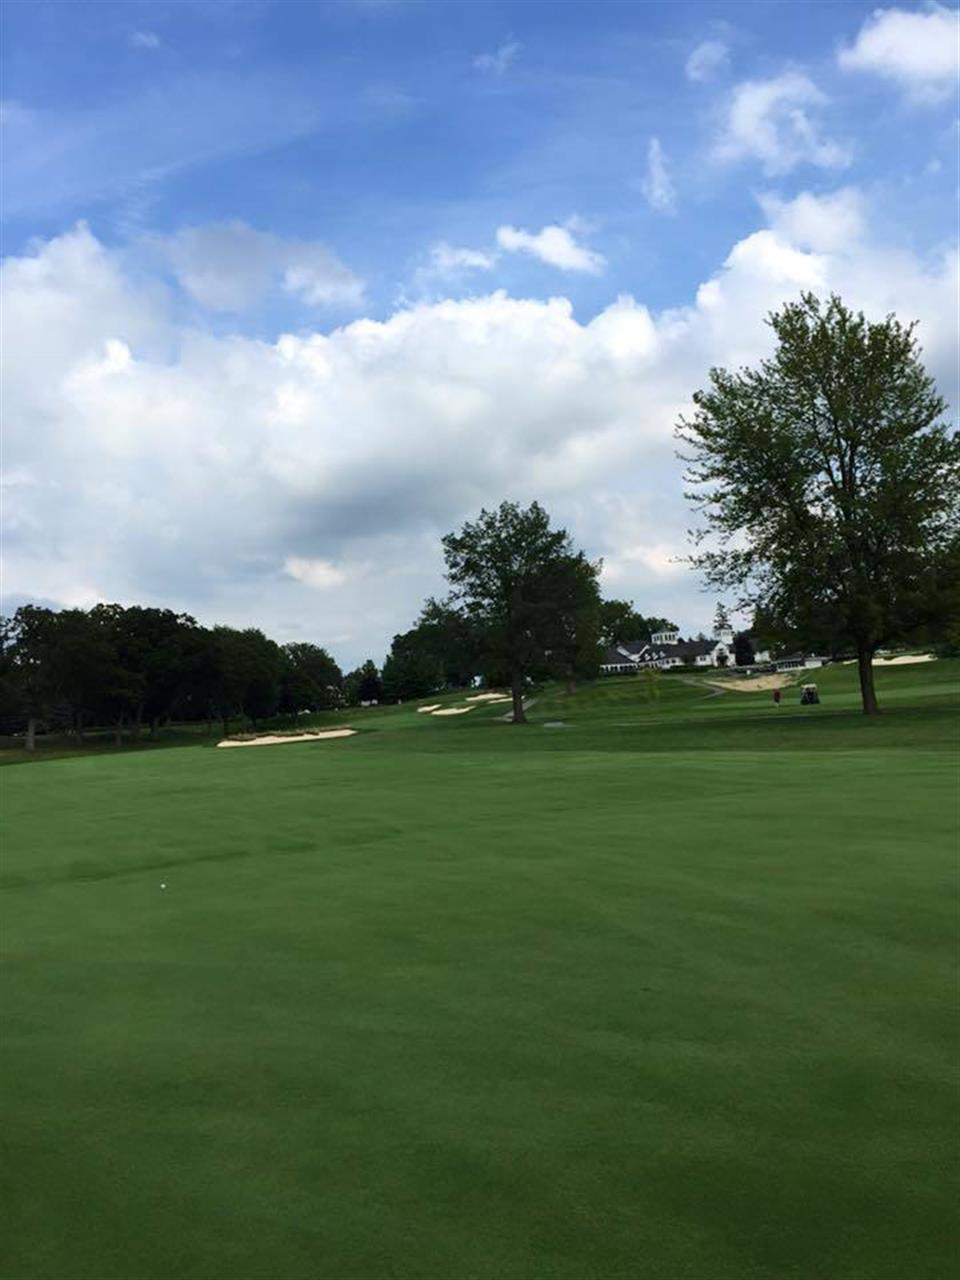 Golf course at Orchard Lake Country Club #OrchardLake #Michigan